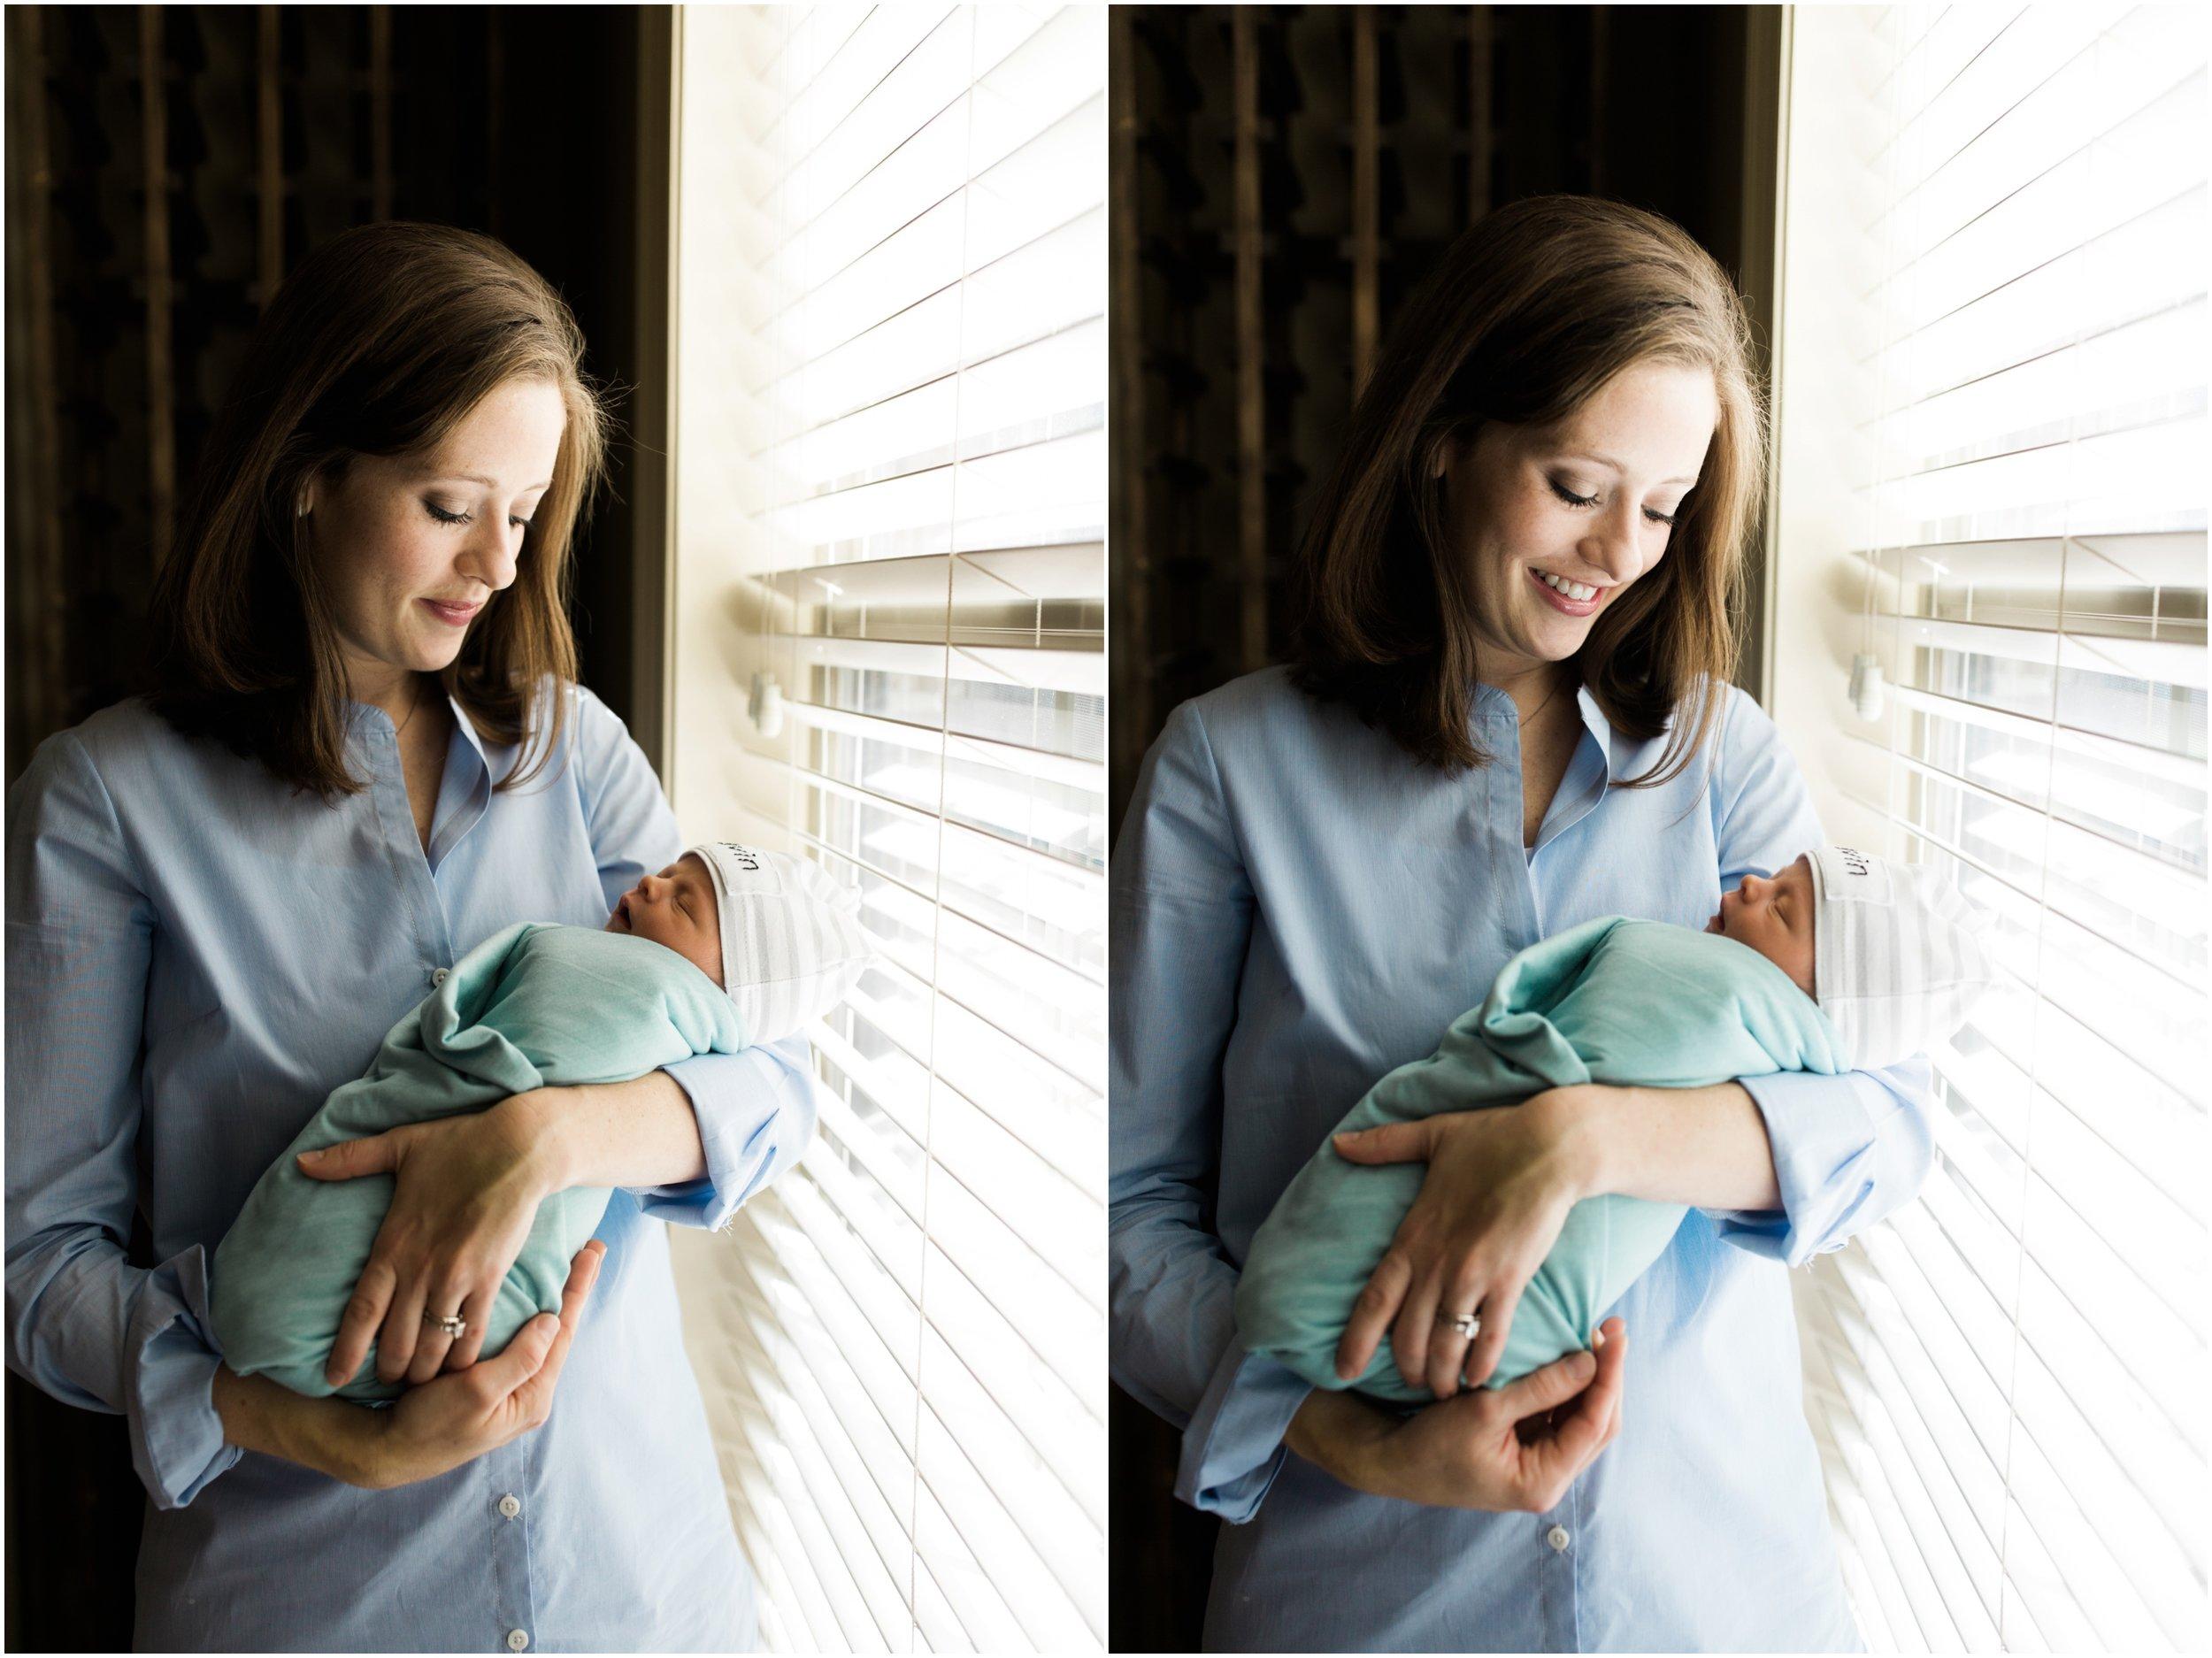 Aldrige-Family-2017-August-113_quaint-and-whim-lifestyle-newborn-photographer-louisiana-aldrige-family-.jpg